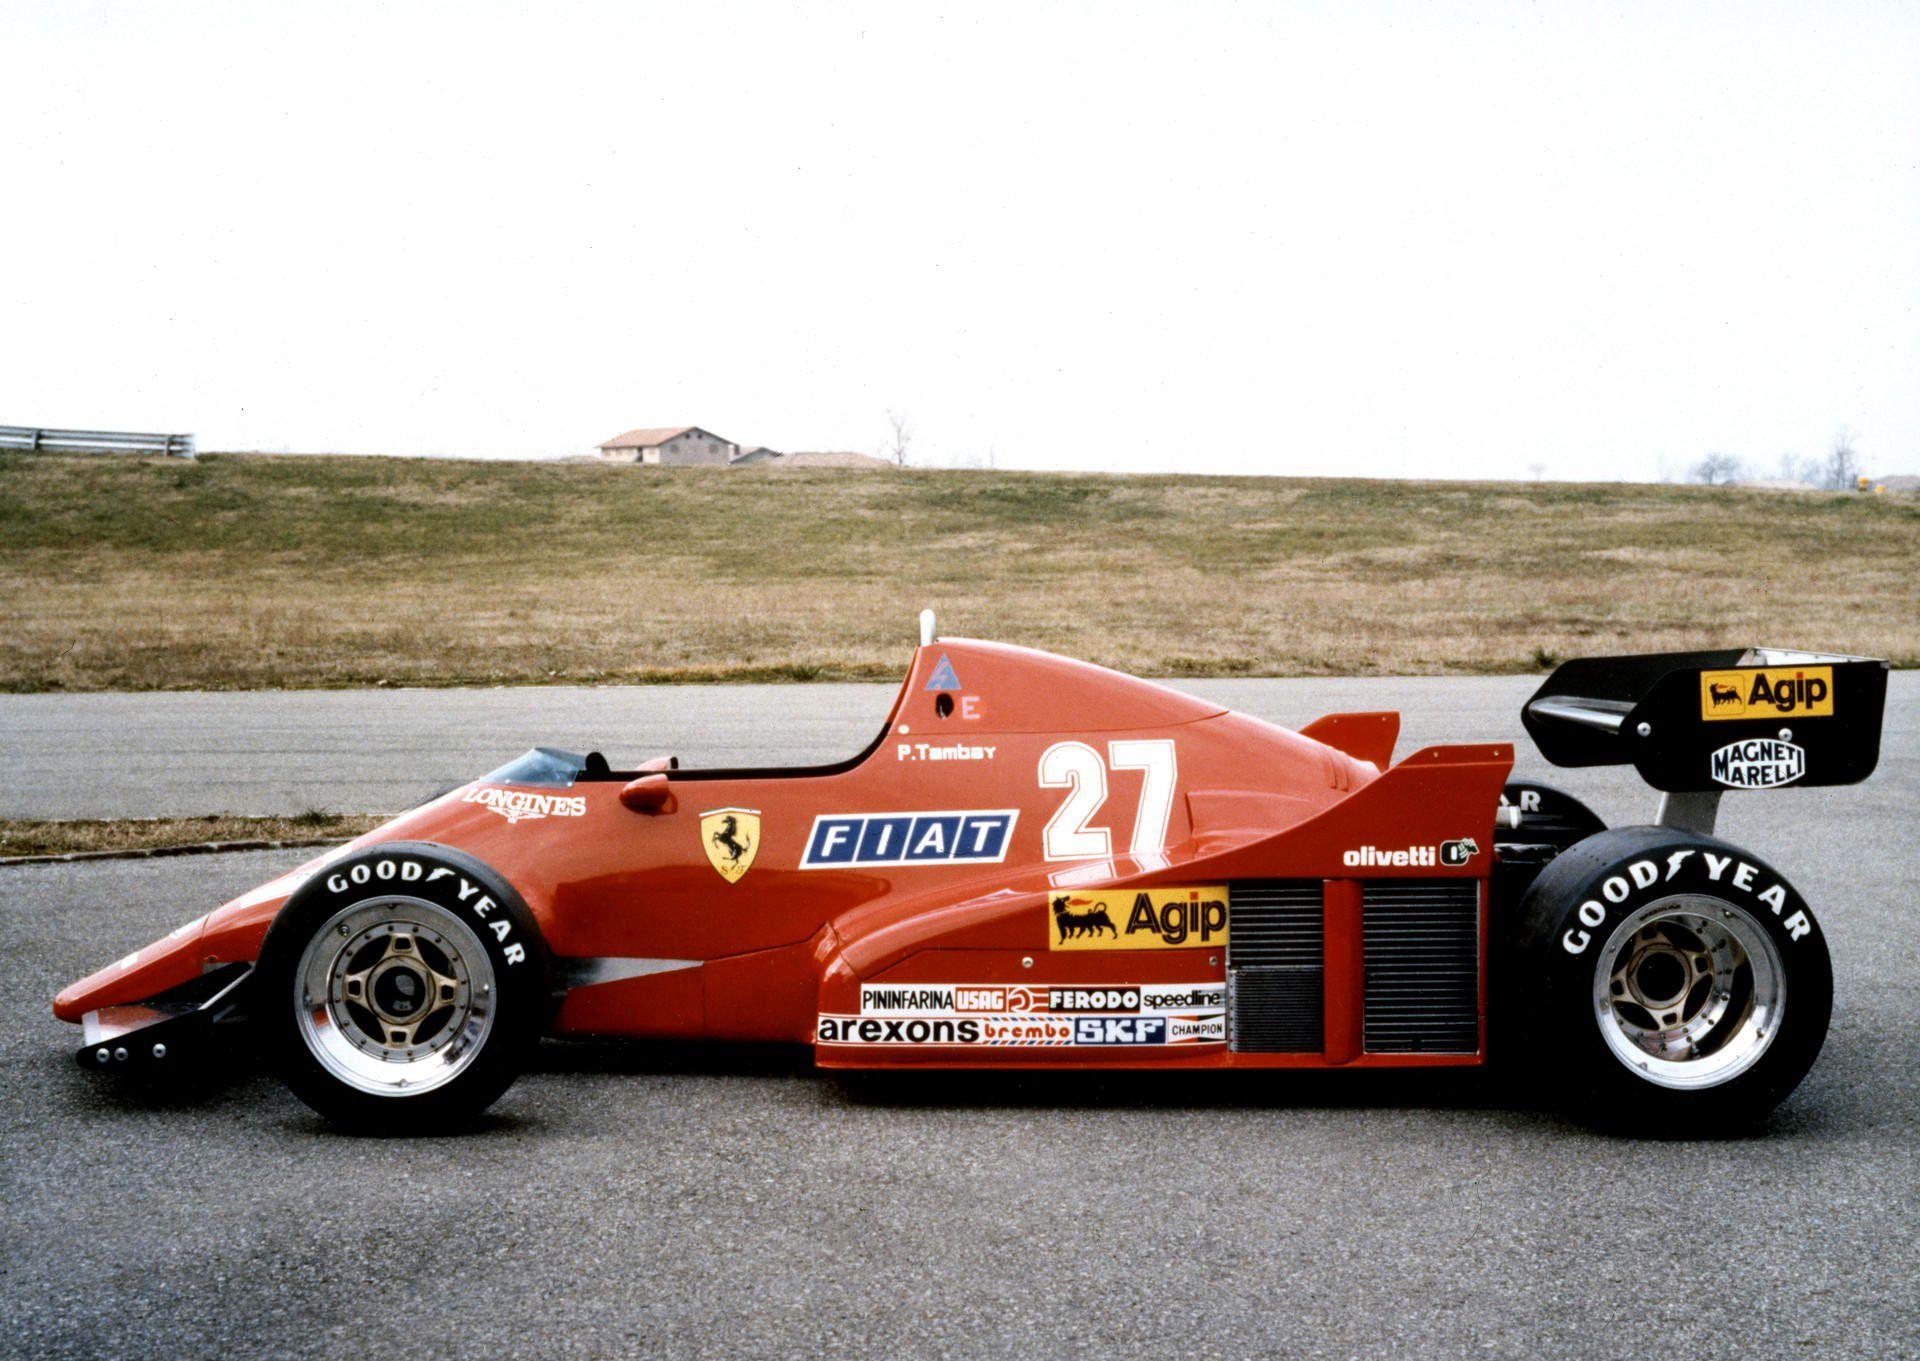 Ferrari 126 C2b 1983 Formel 1